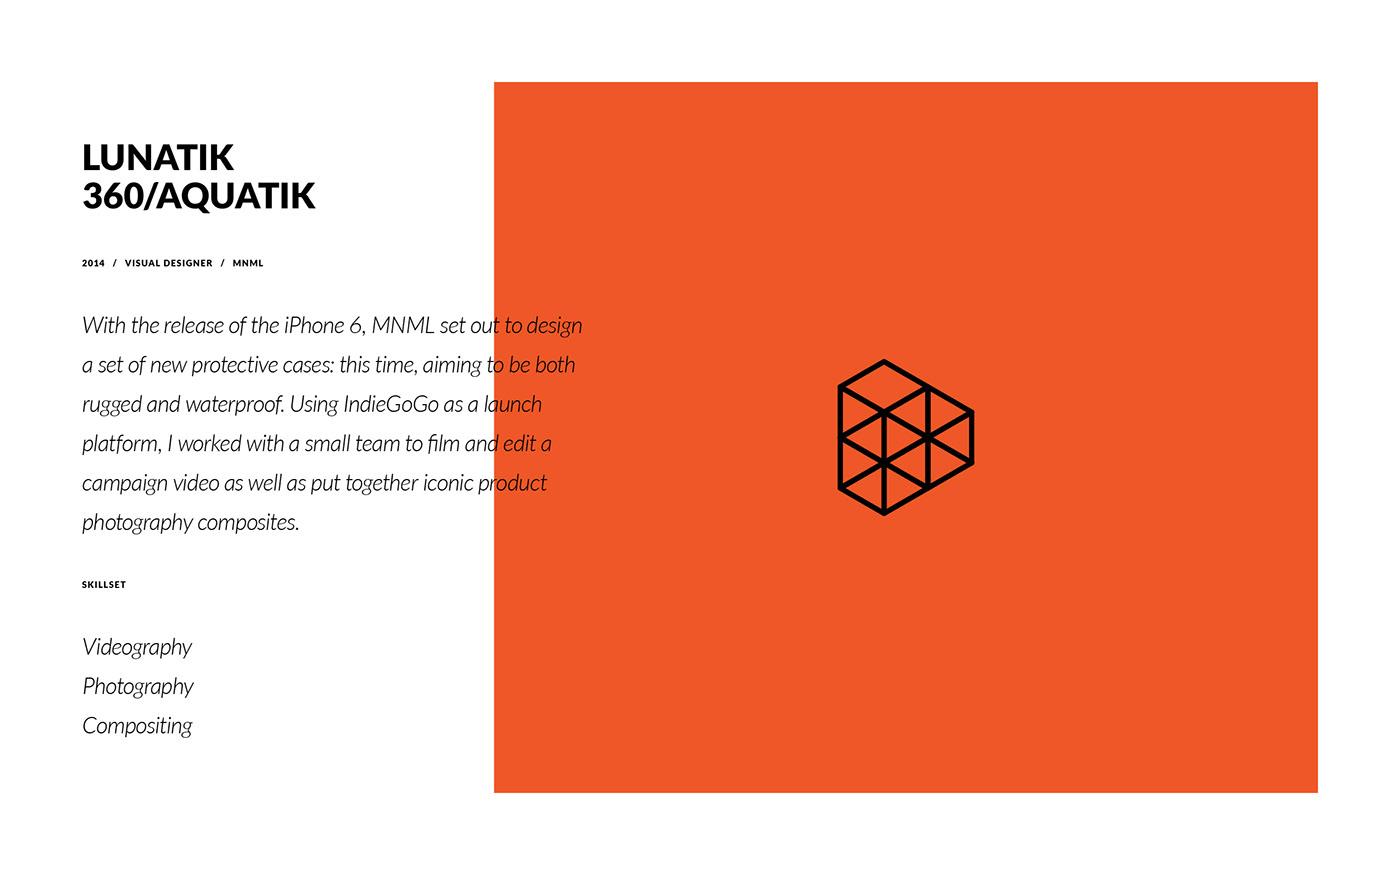 LunaTik taktik water waterproof iphone case Composite Packaging mnml